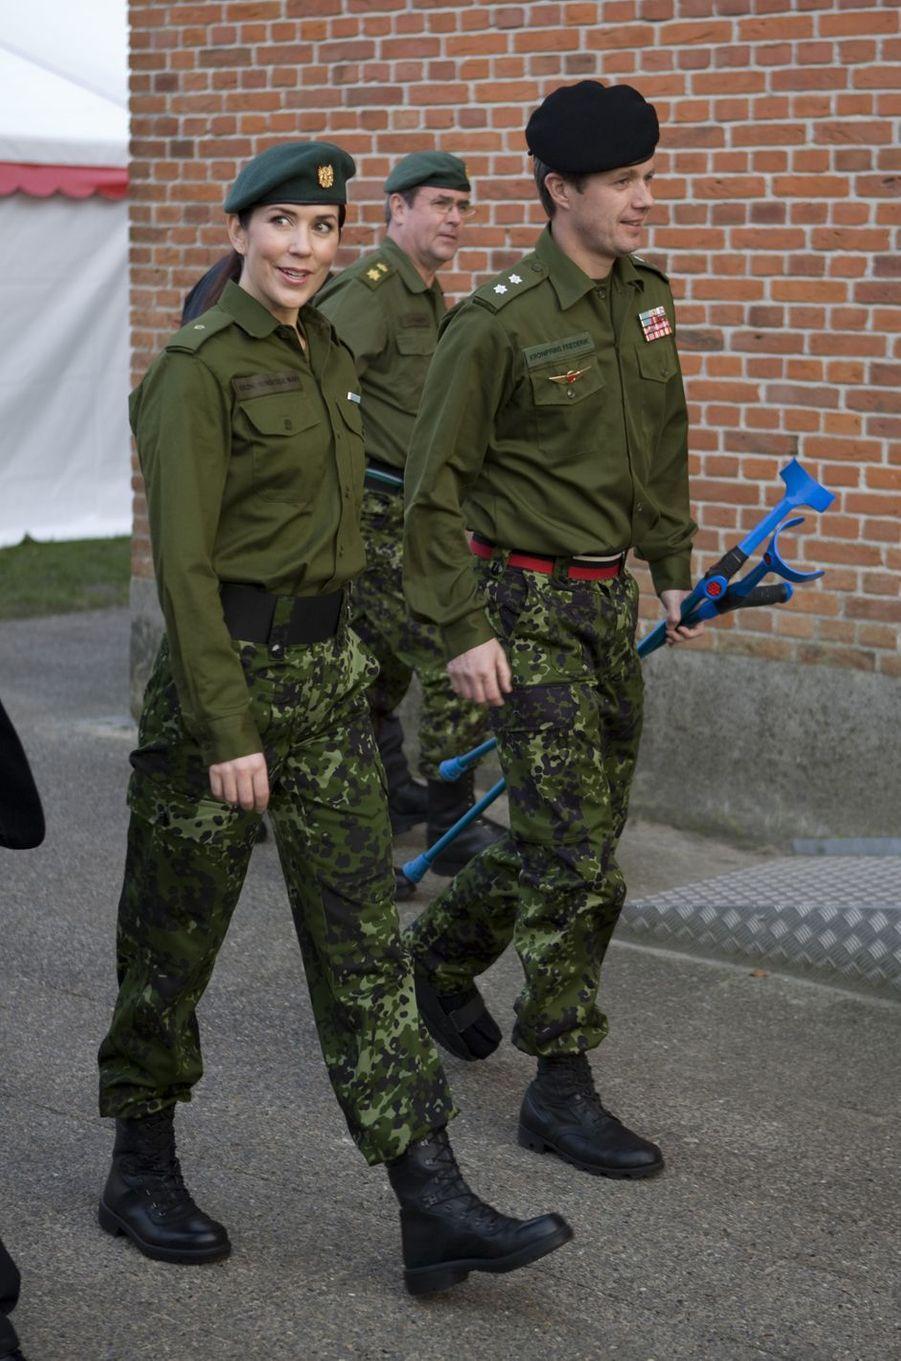 La princesse Mary de Danemark, le 1er avril 2009